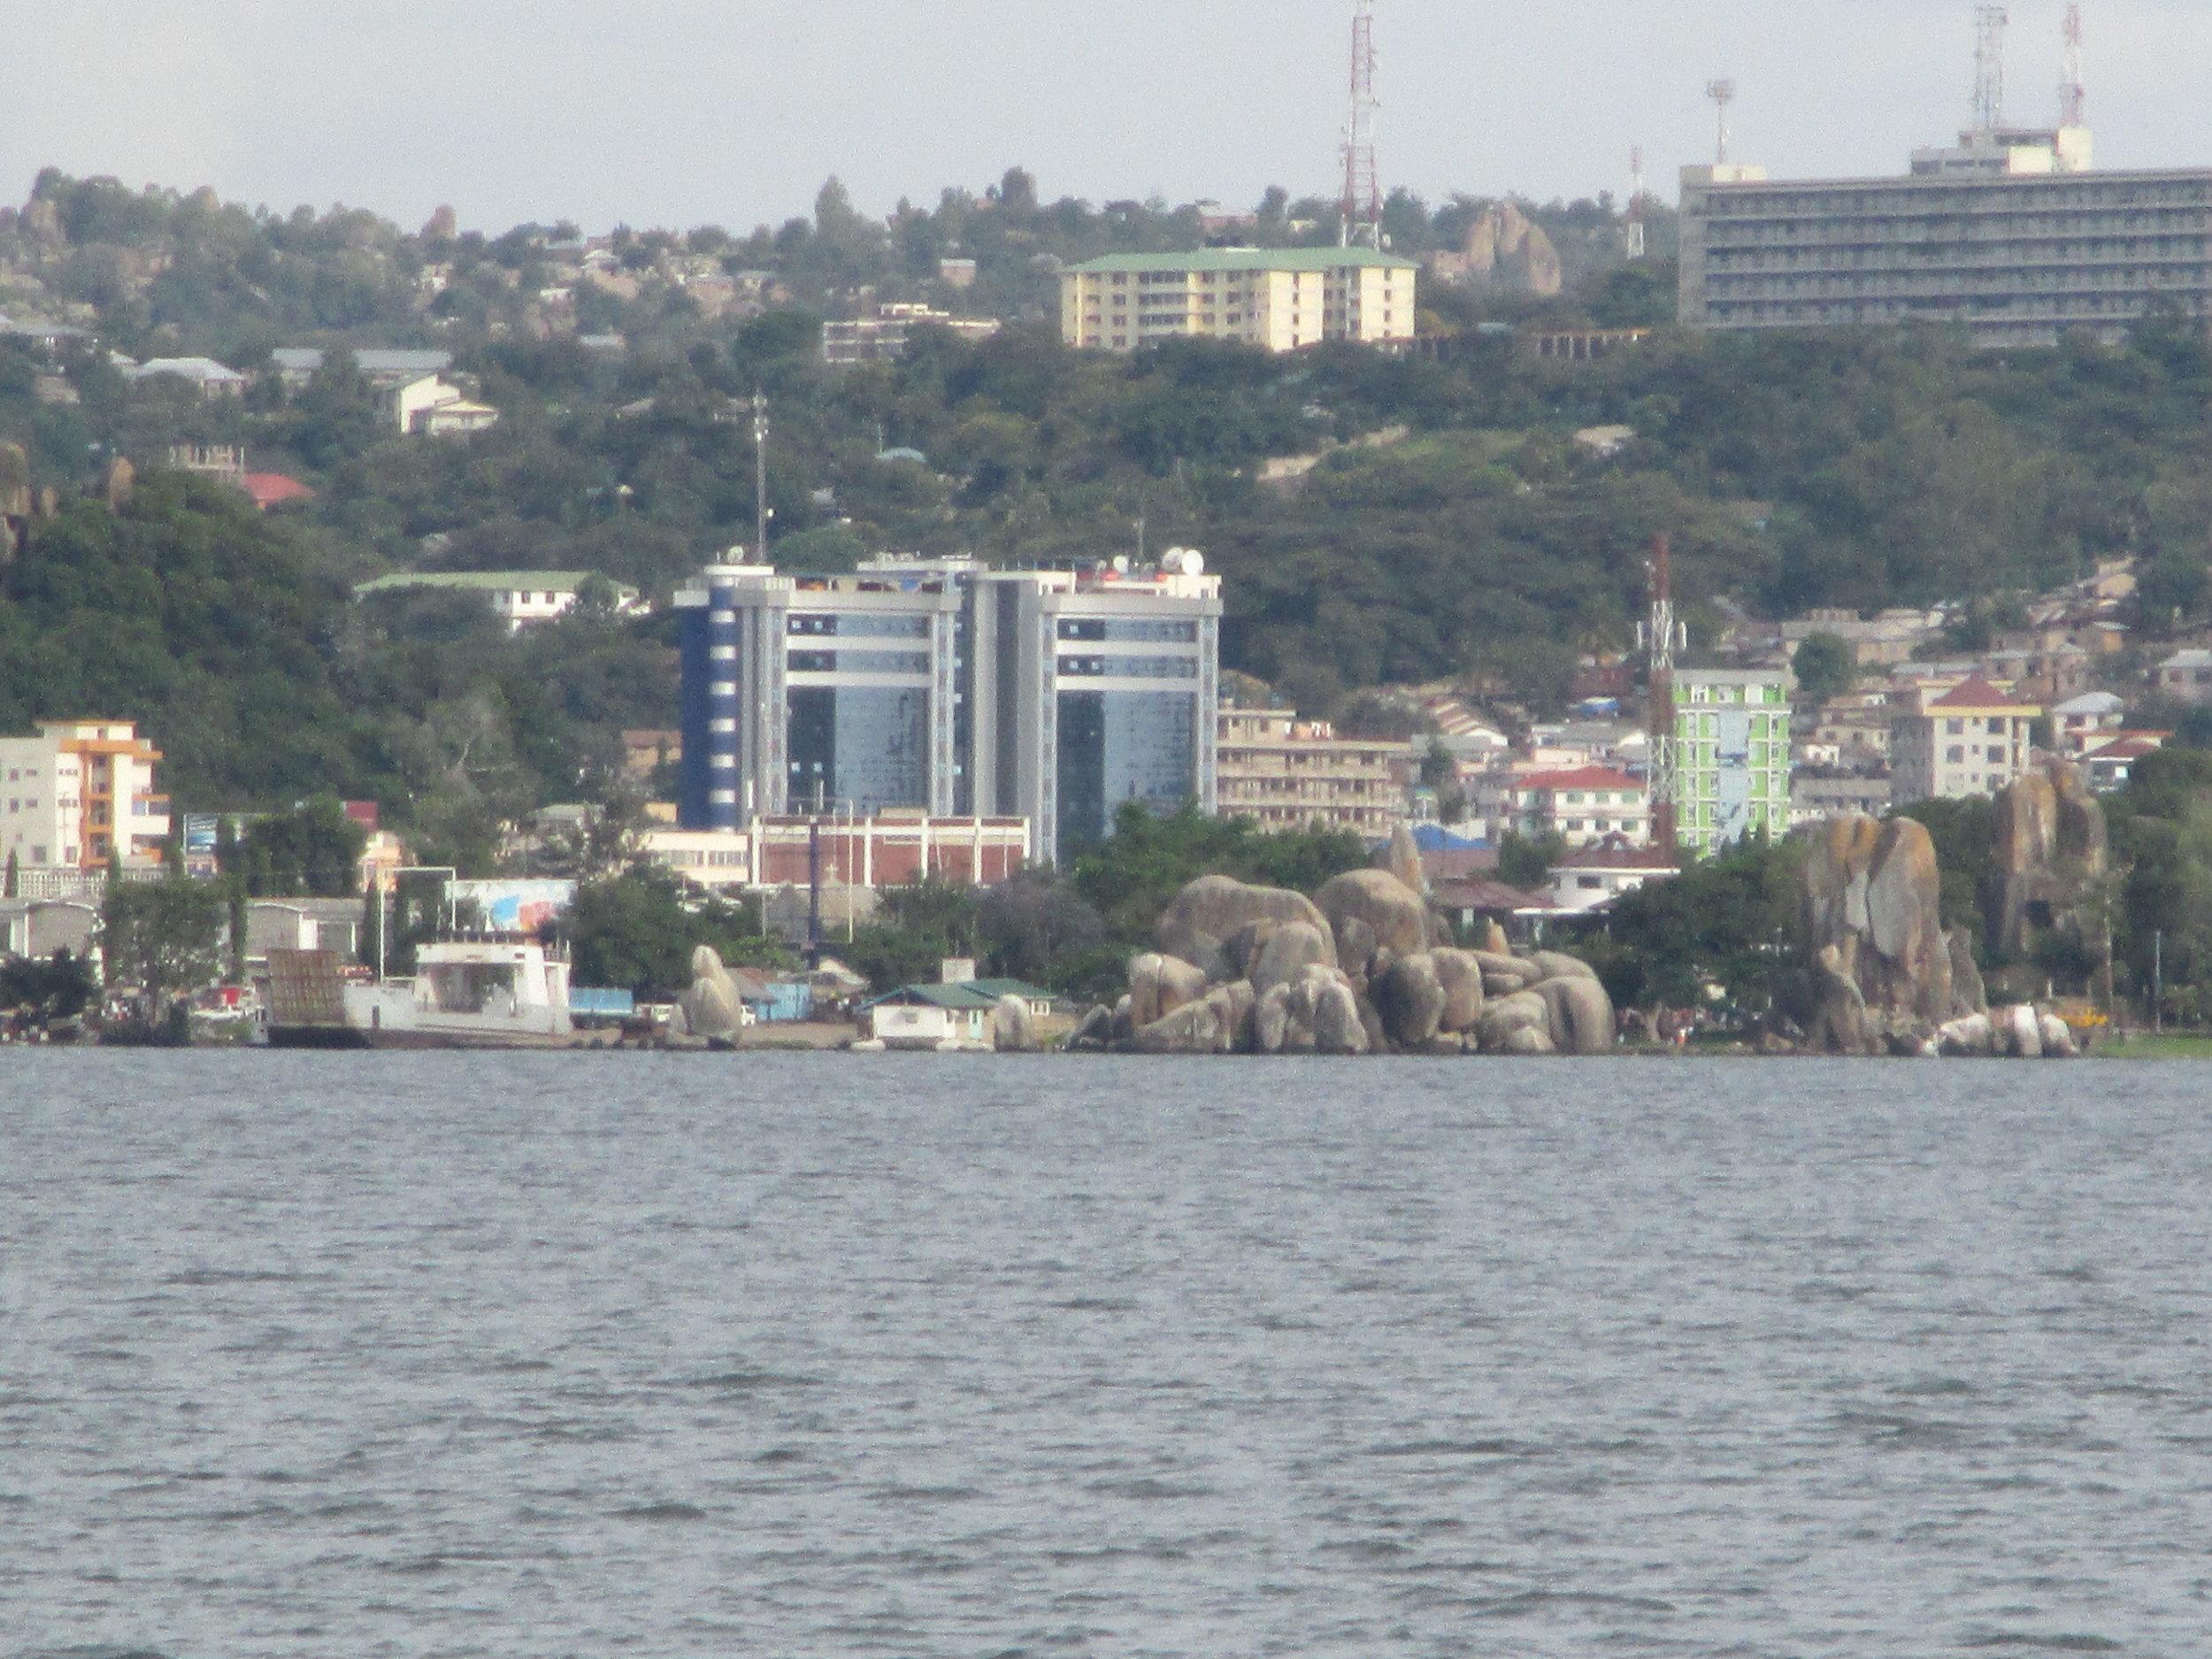 Researchers purchased fish from Mwanza City, Tanzania